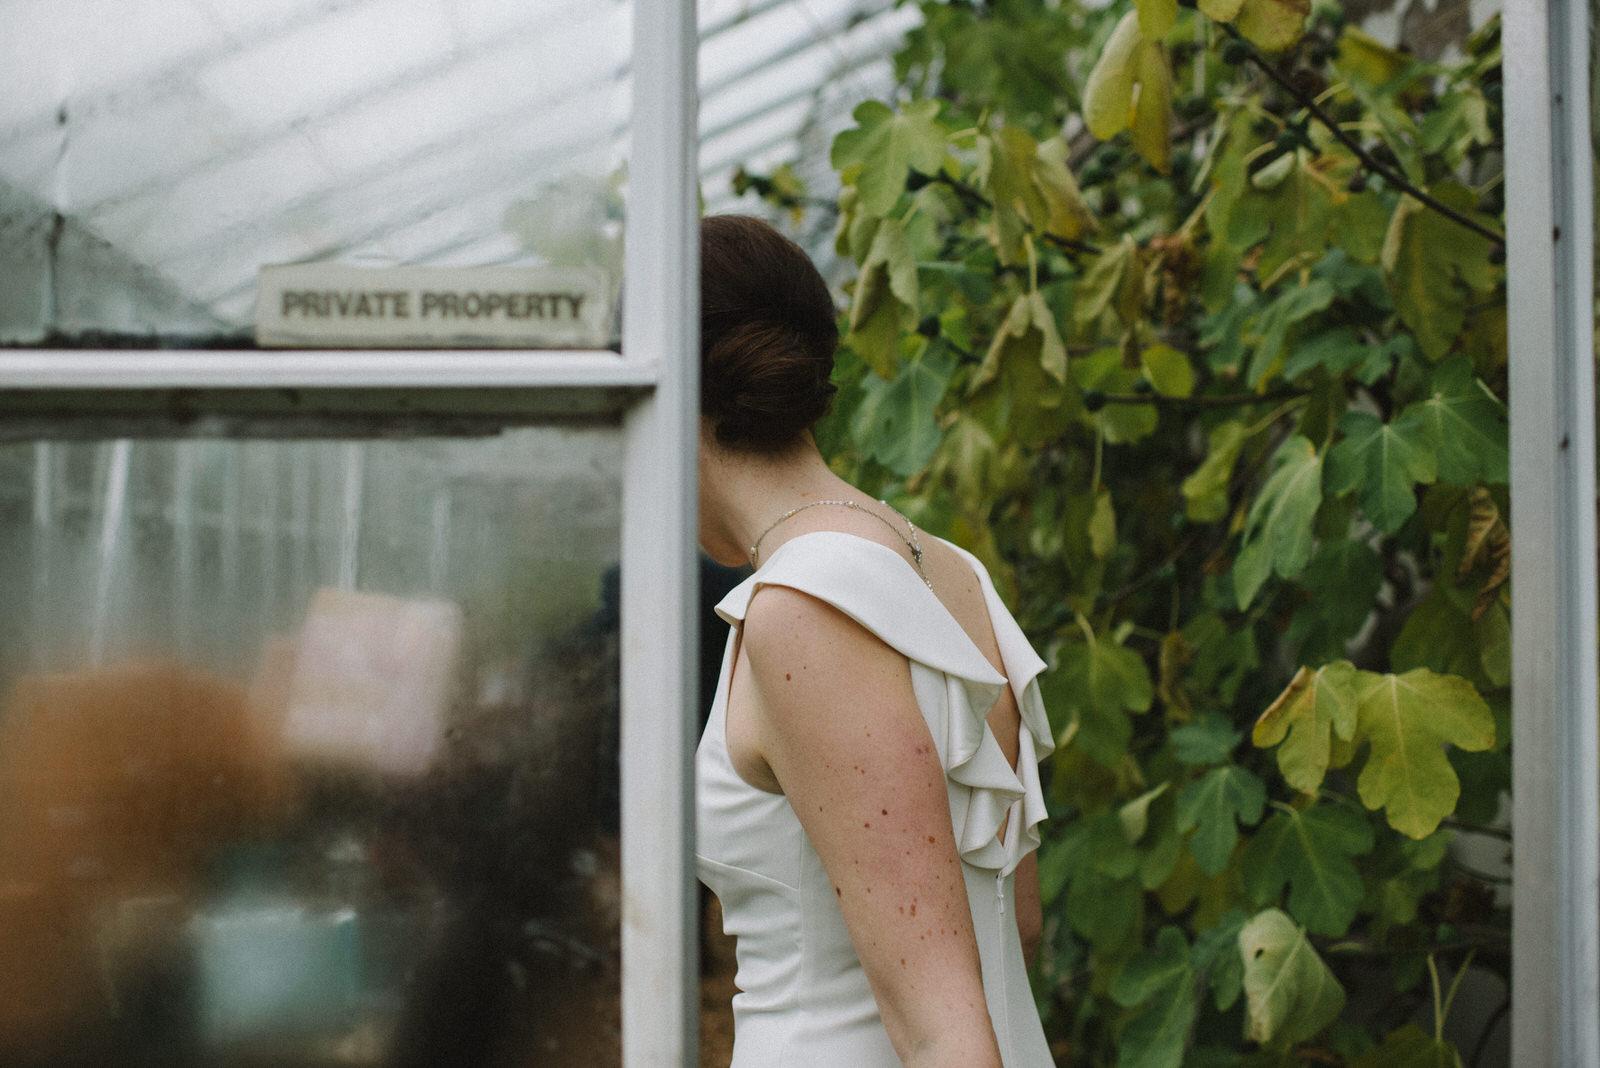 023-COLSTOUN-HOUSE-WEDDING-ALTERNATIVE-WEDDING-PHOTOGRAPHER-GLASGOW-WEDDING-PHOTOGRAPHER-STYLISH-SCOTTISH-WEDDING.JPG